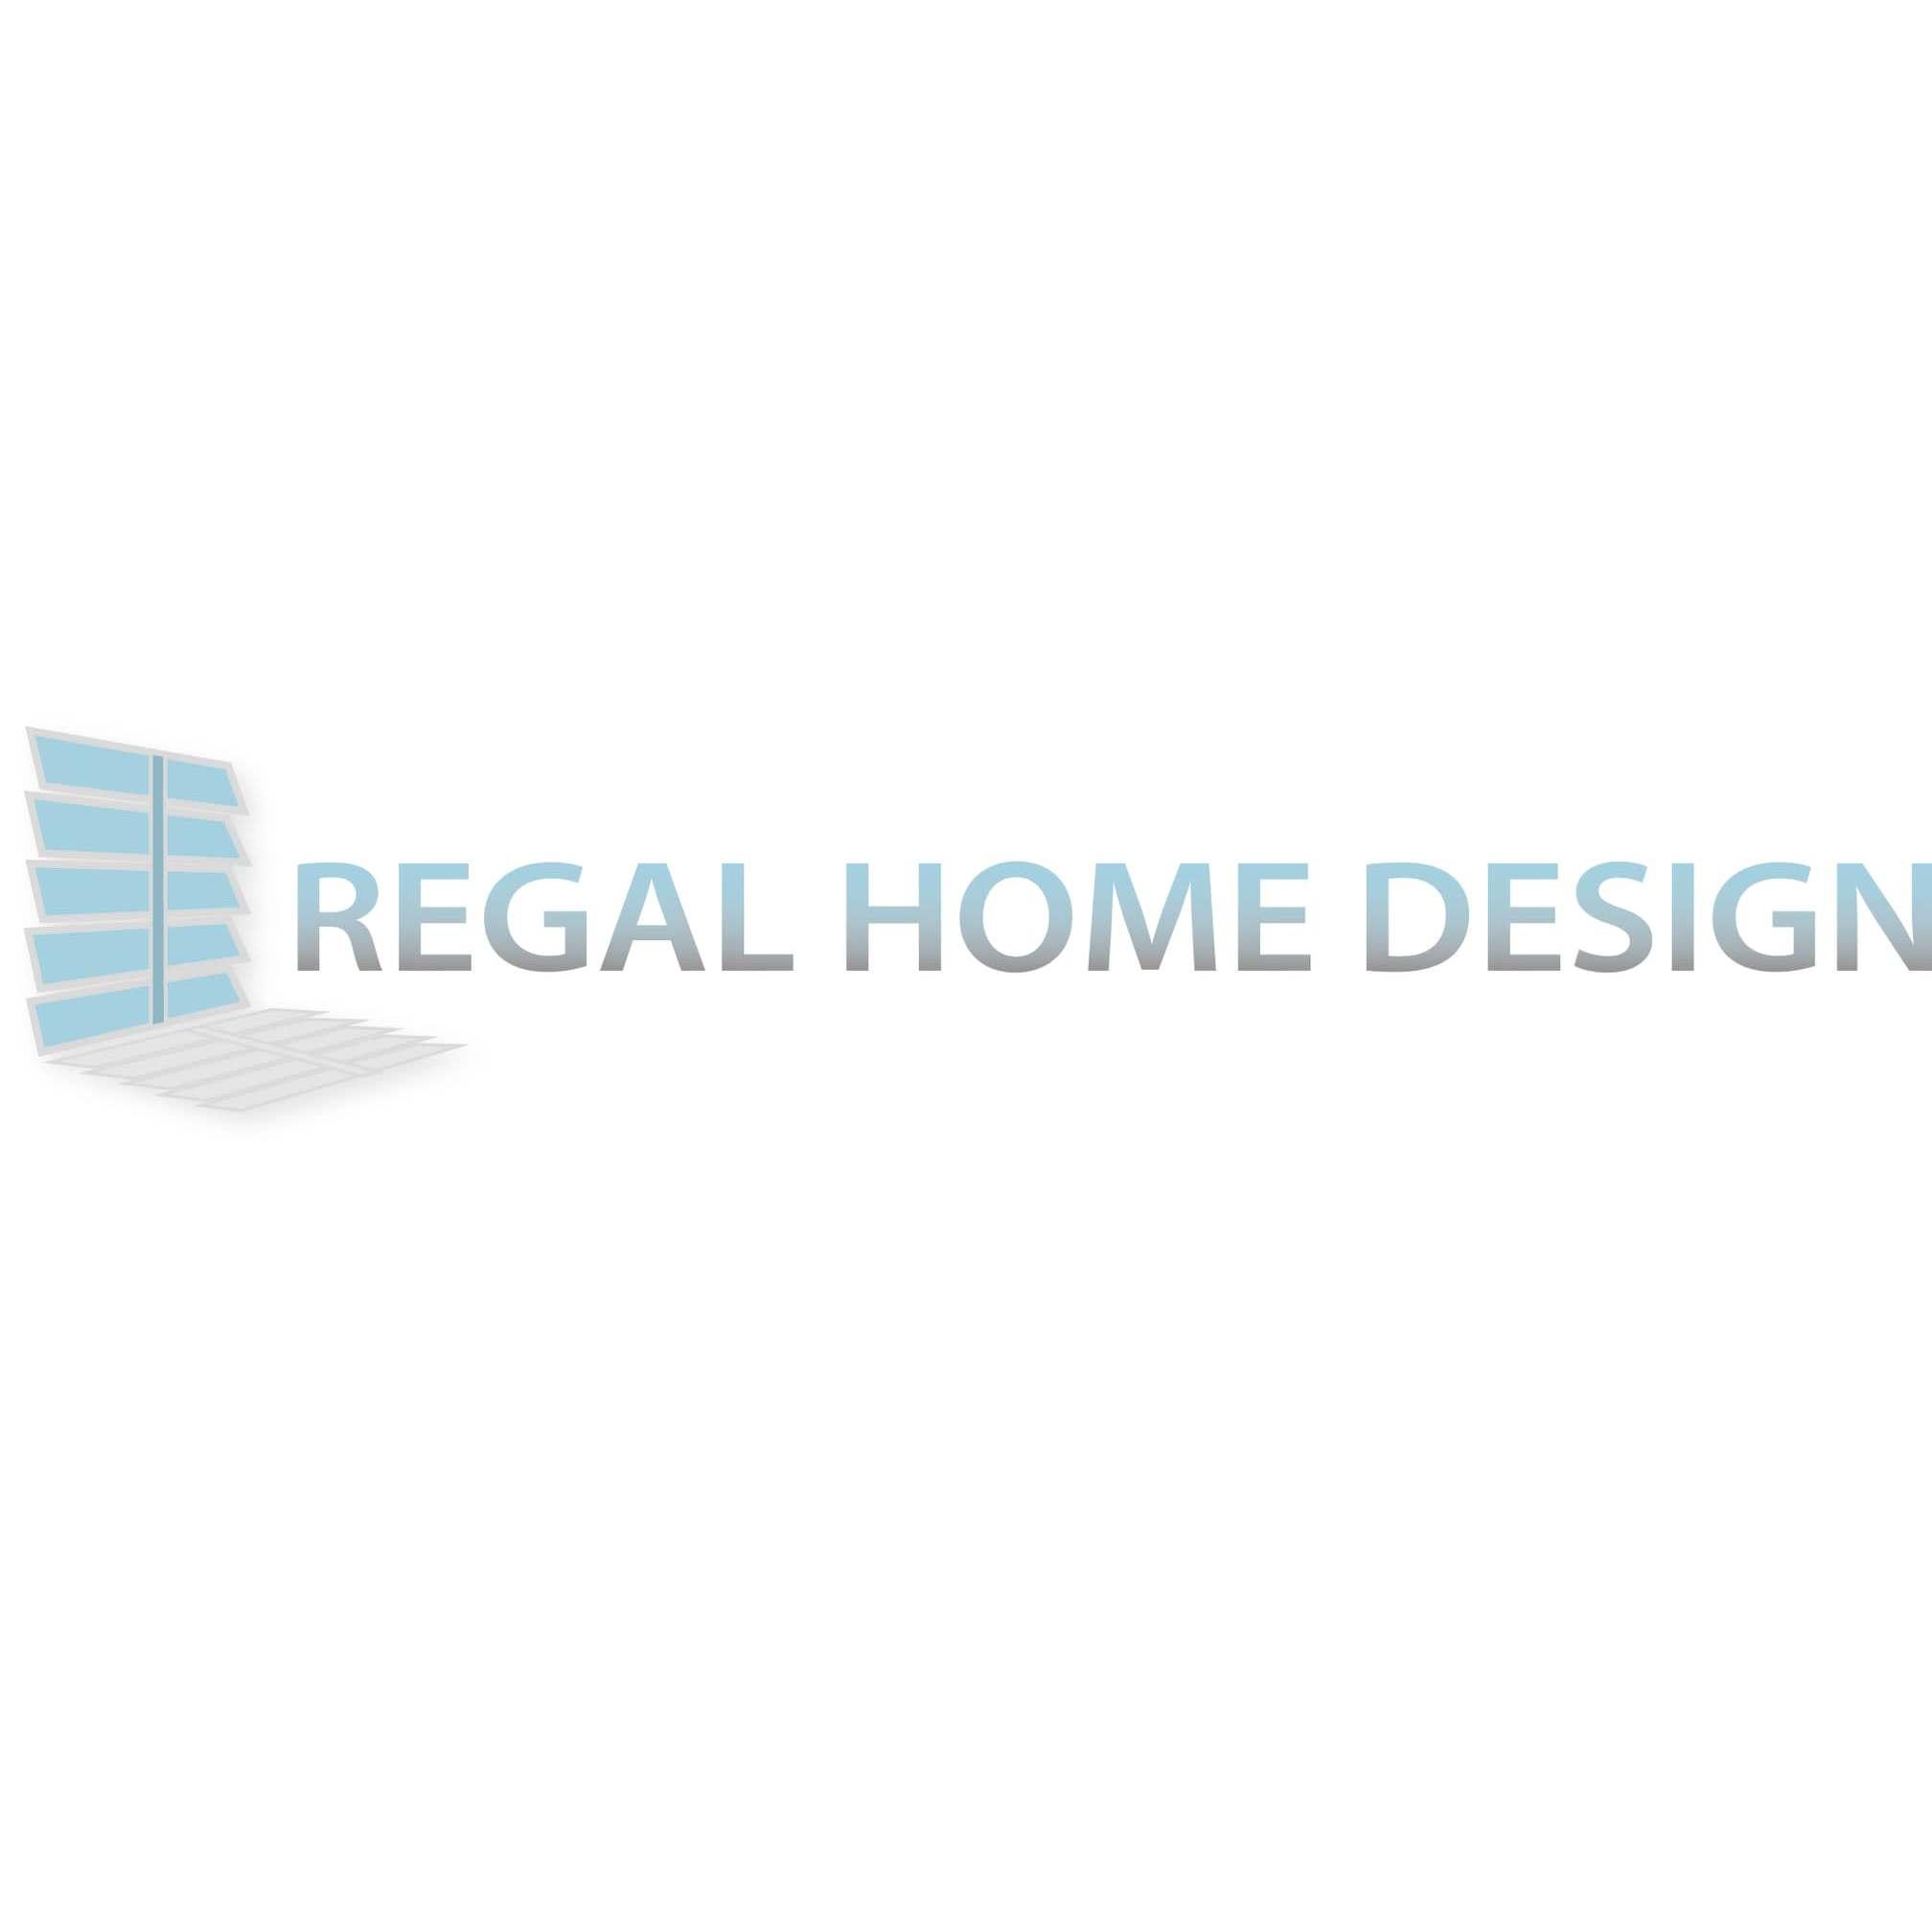 Regal Home Design Ltd - Sutton Coldfield, West Midlands B75 5BS - 01212 705604 | ShowMeLocal.com